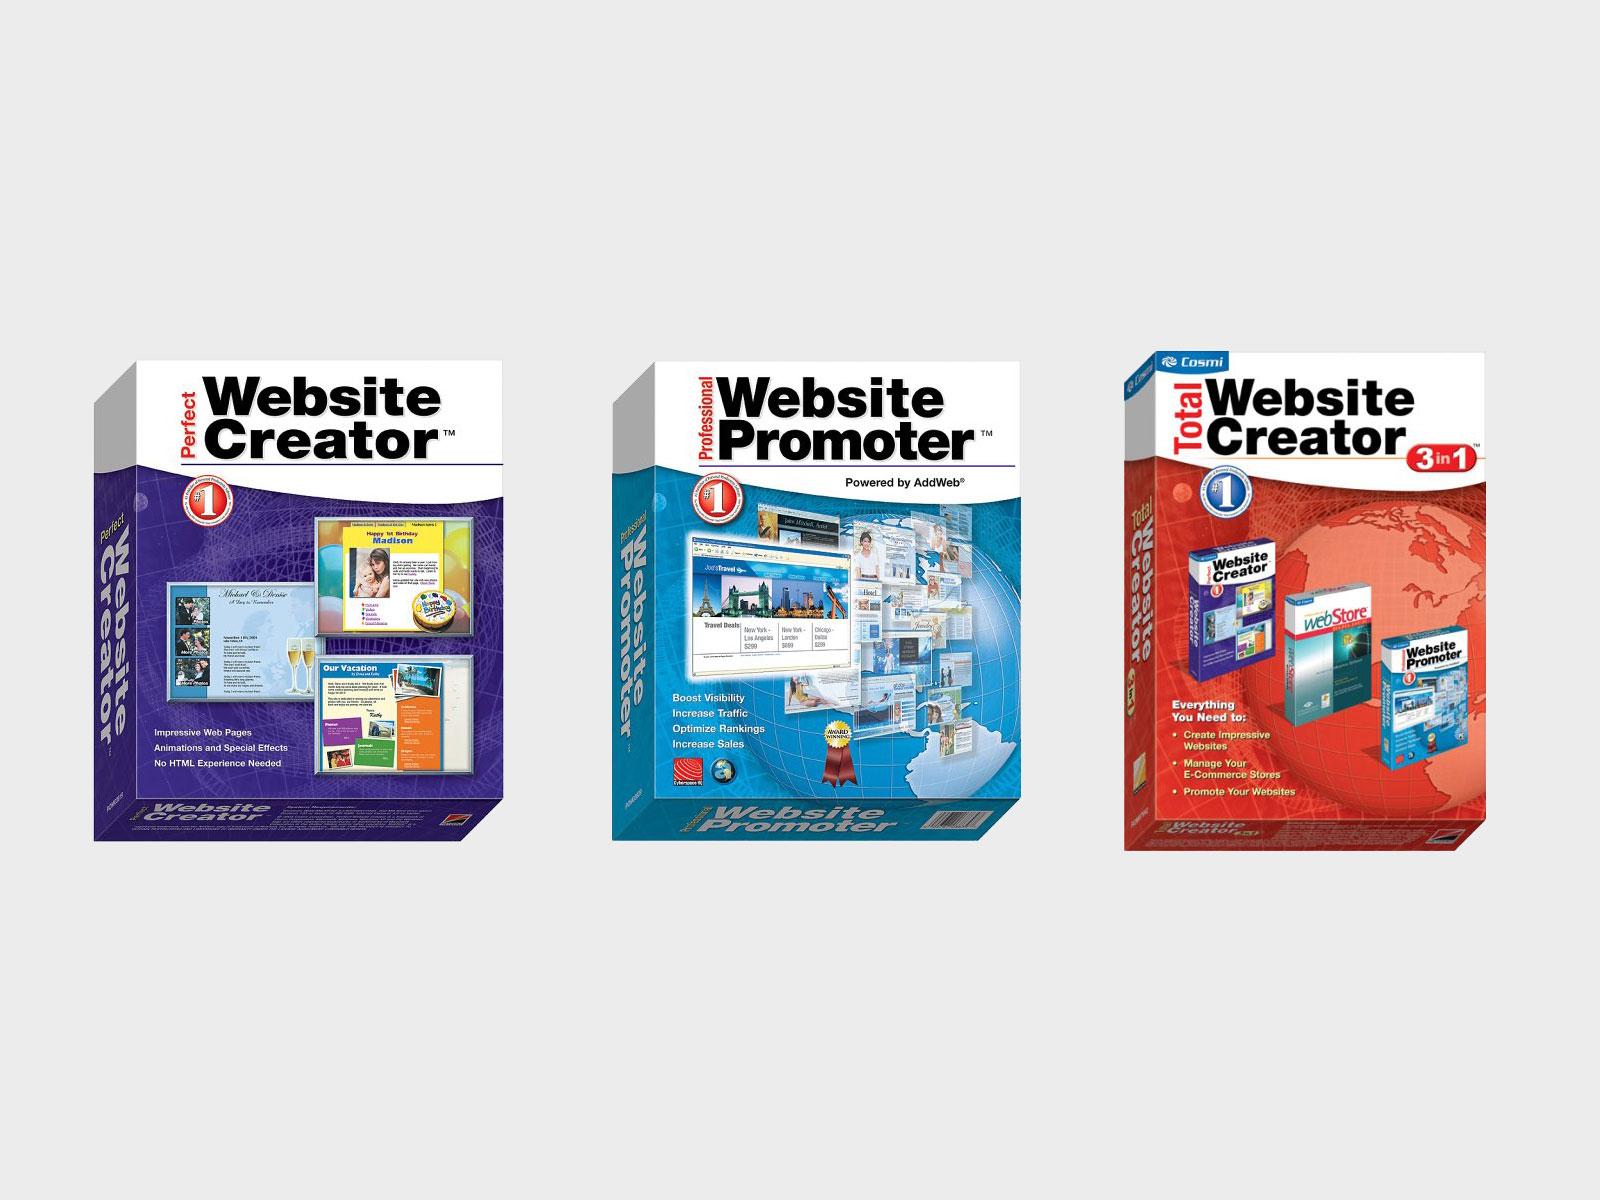 Software Packaging for Website Suite